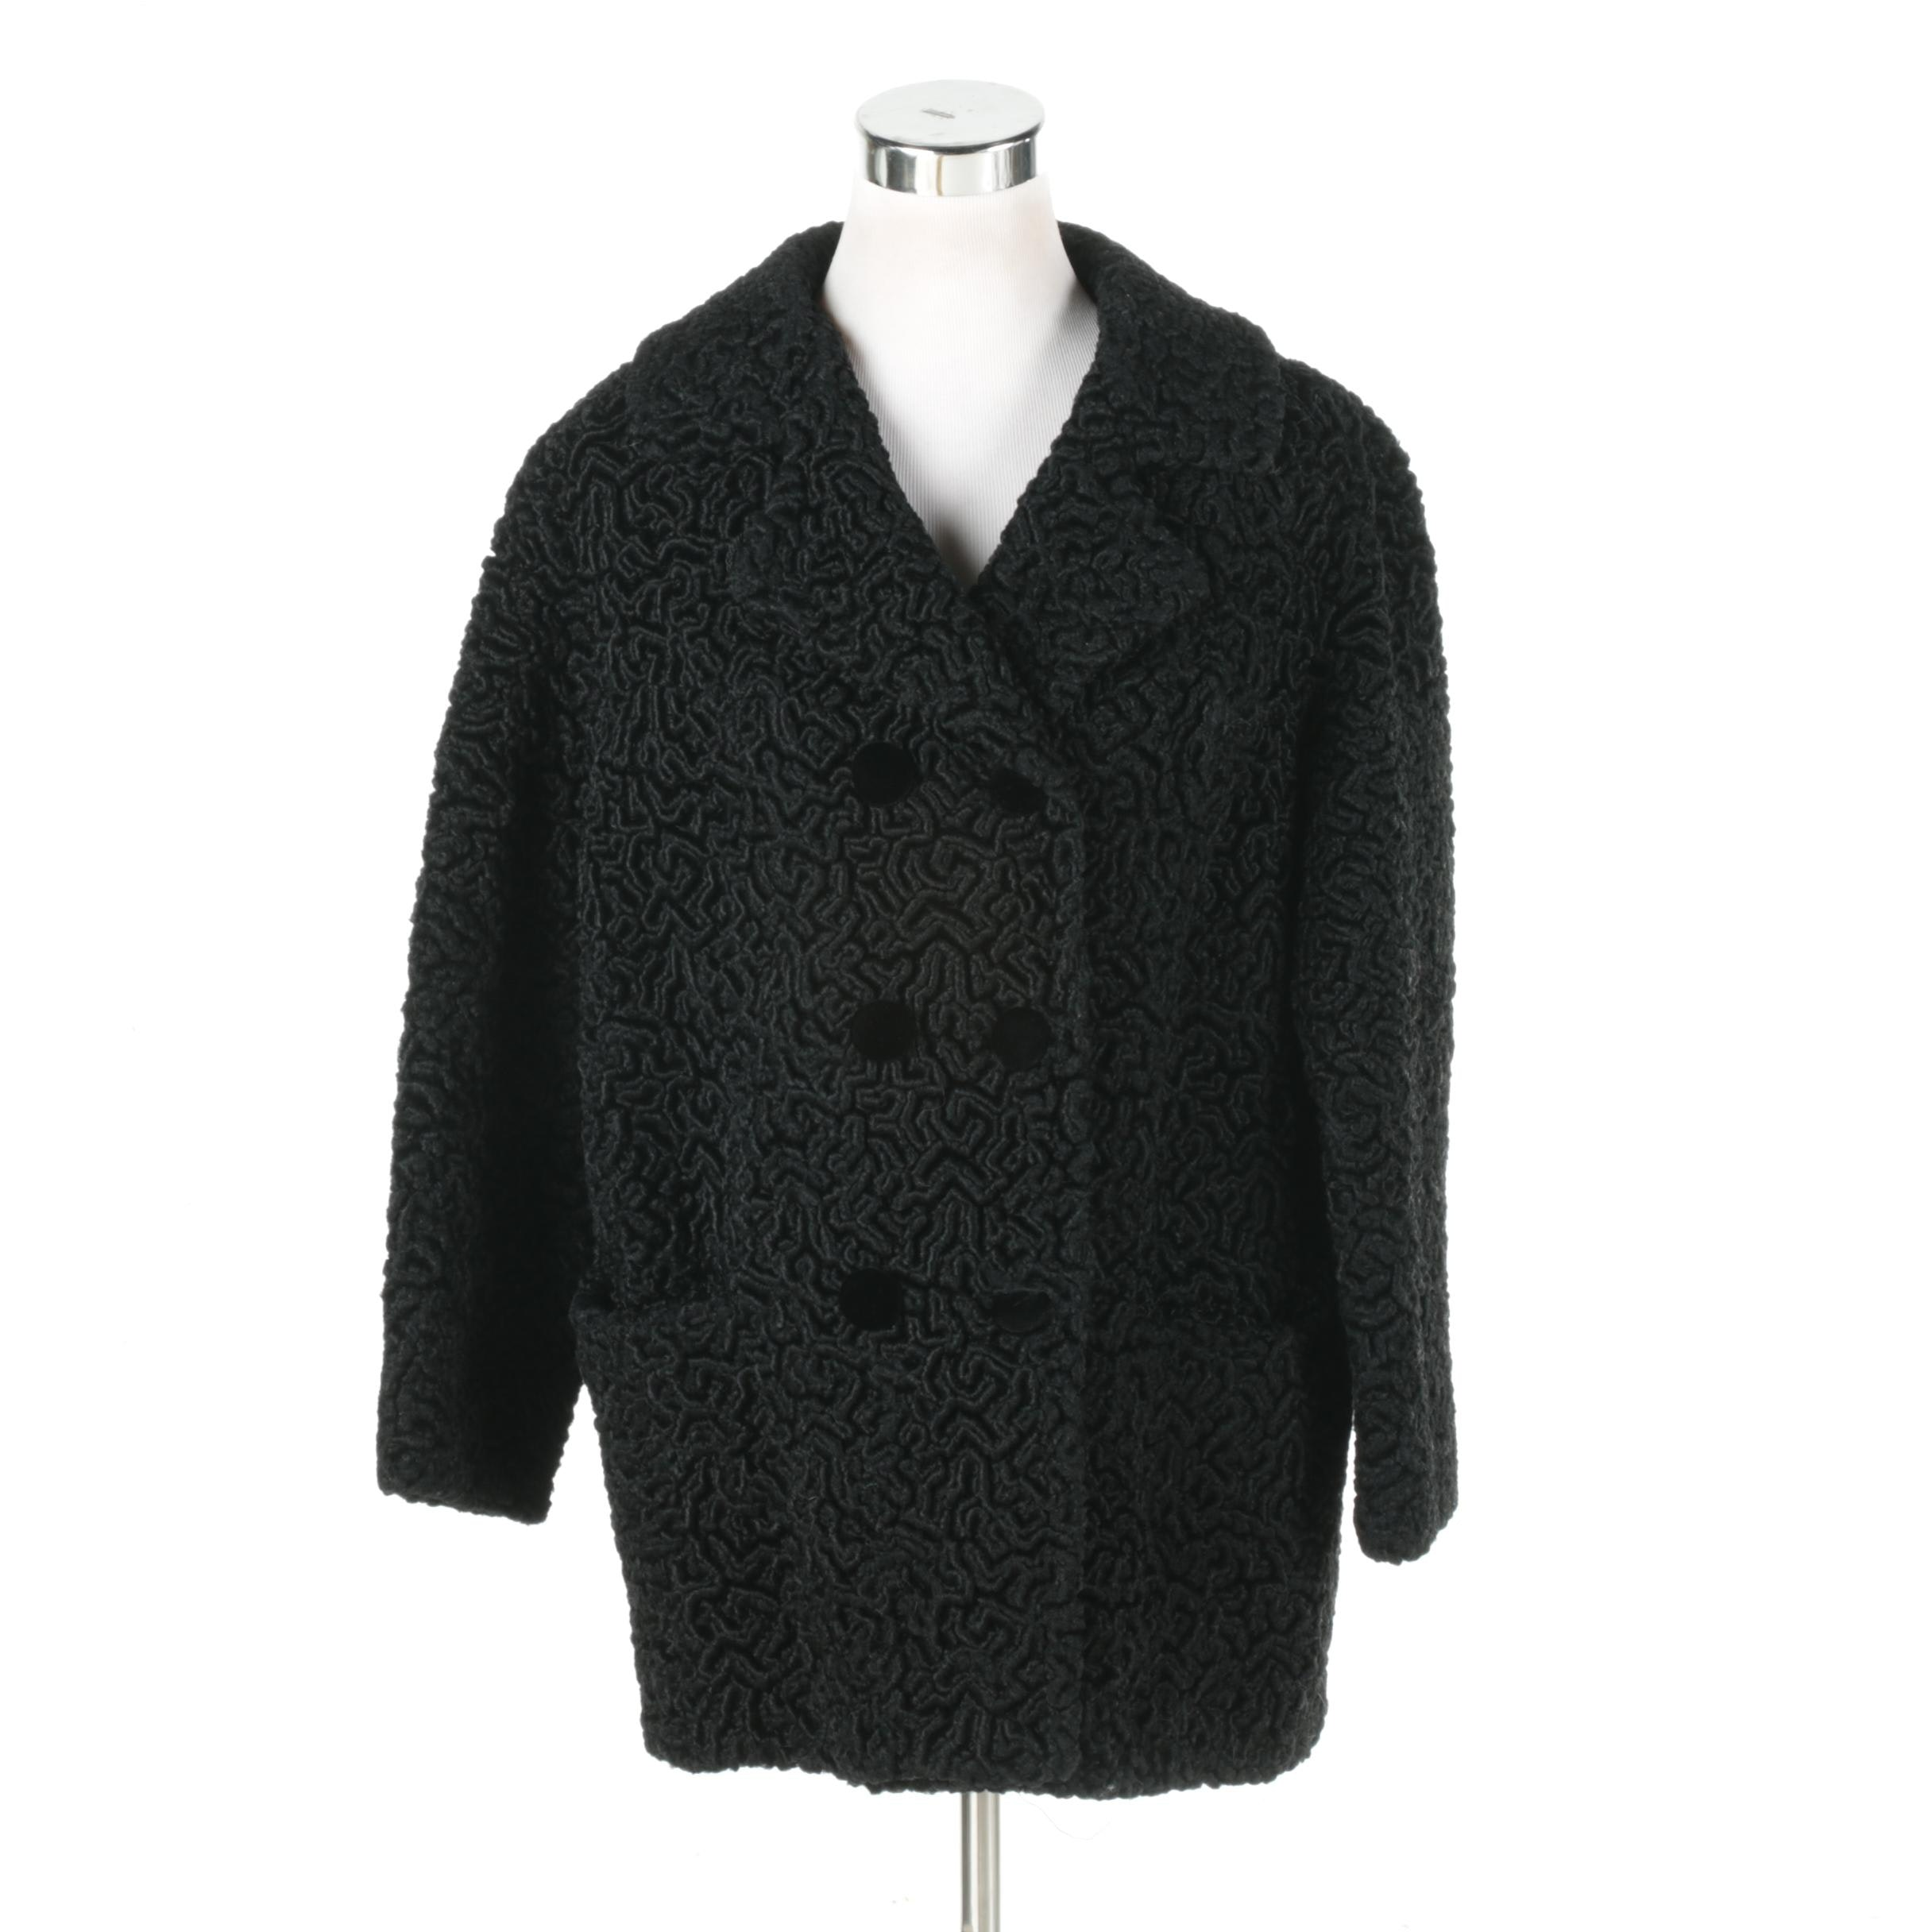 1960s Vintage Opducke's Faux Persian Lamb Fur Coat